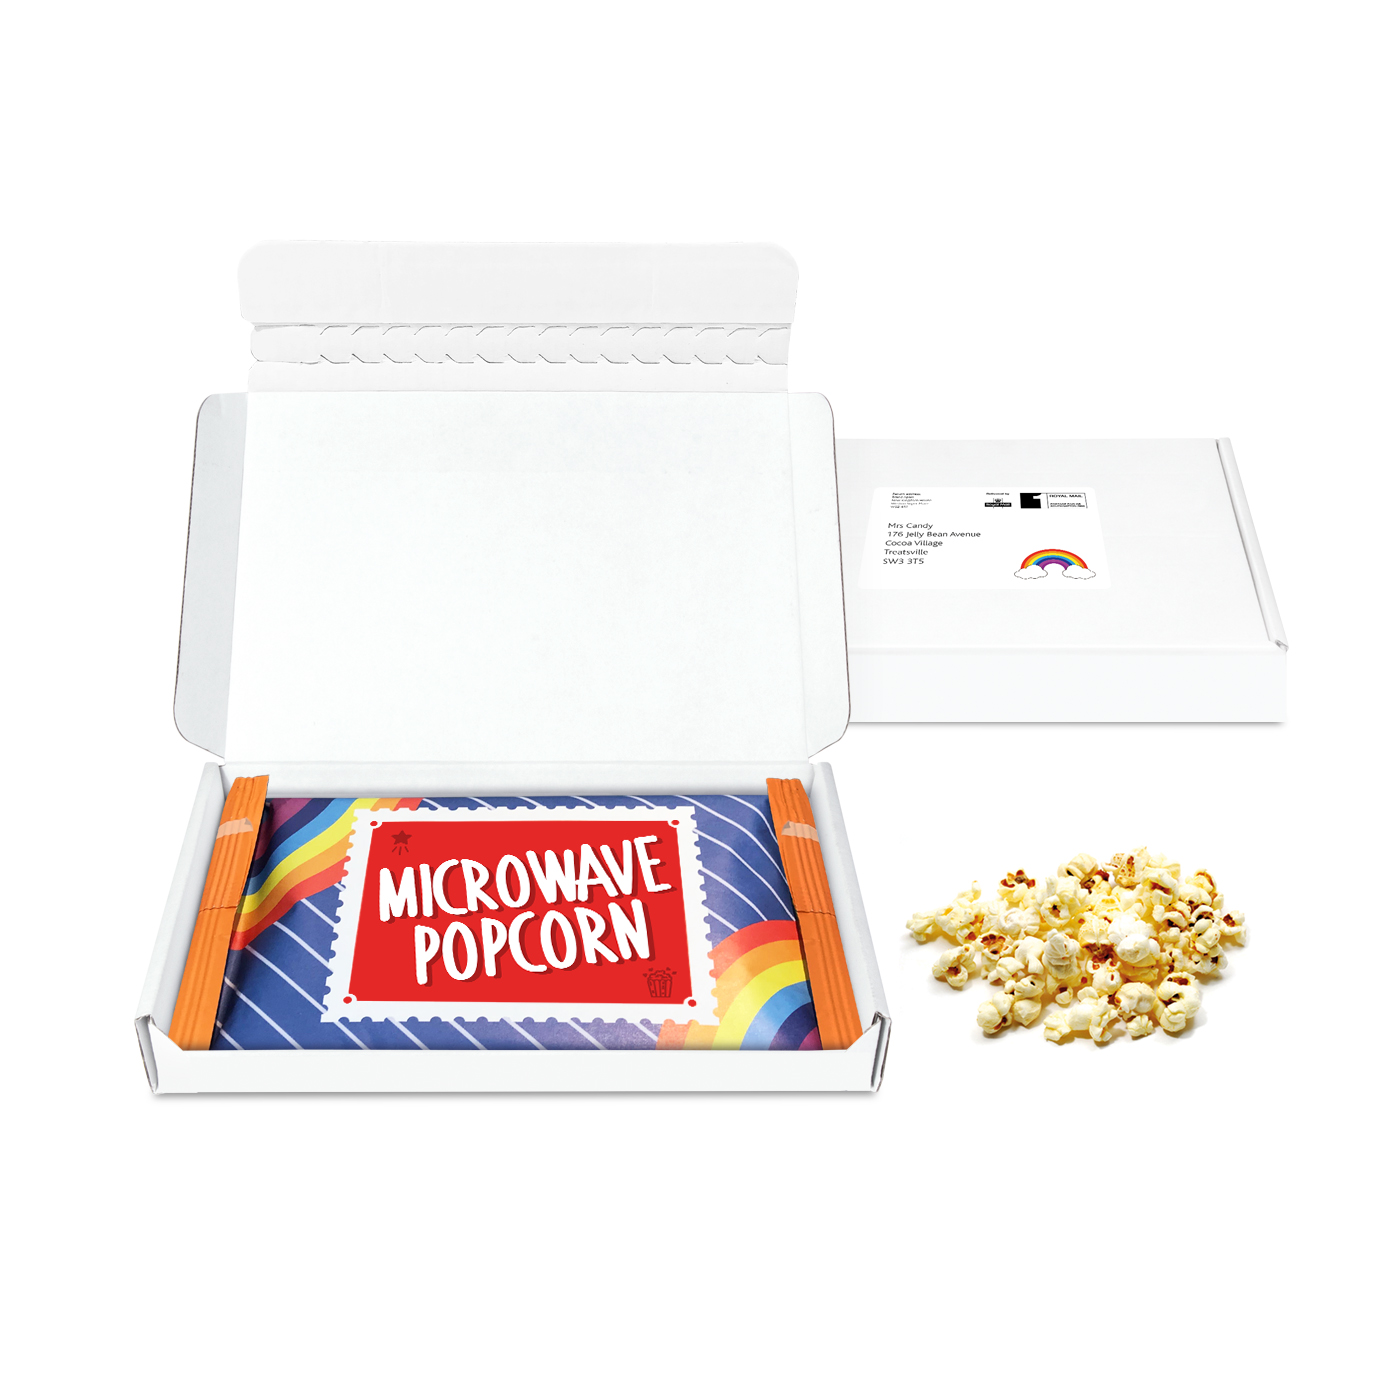 MINI POSTAL BOX - MICROWAVE POPCORN